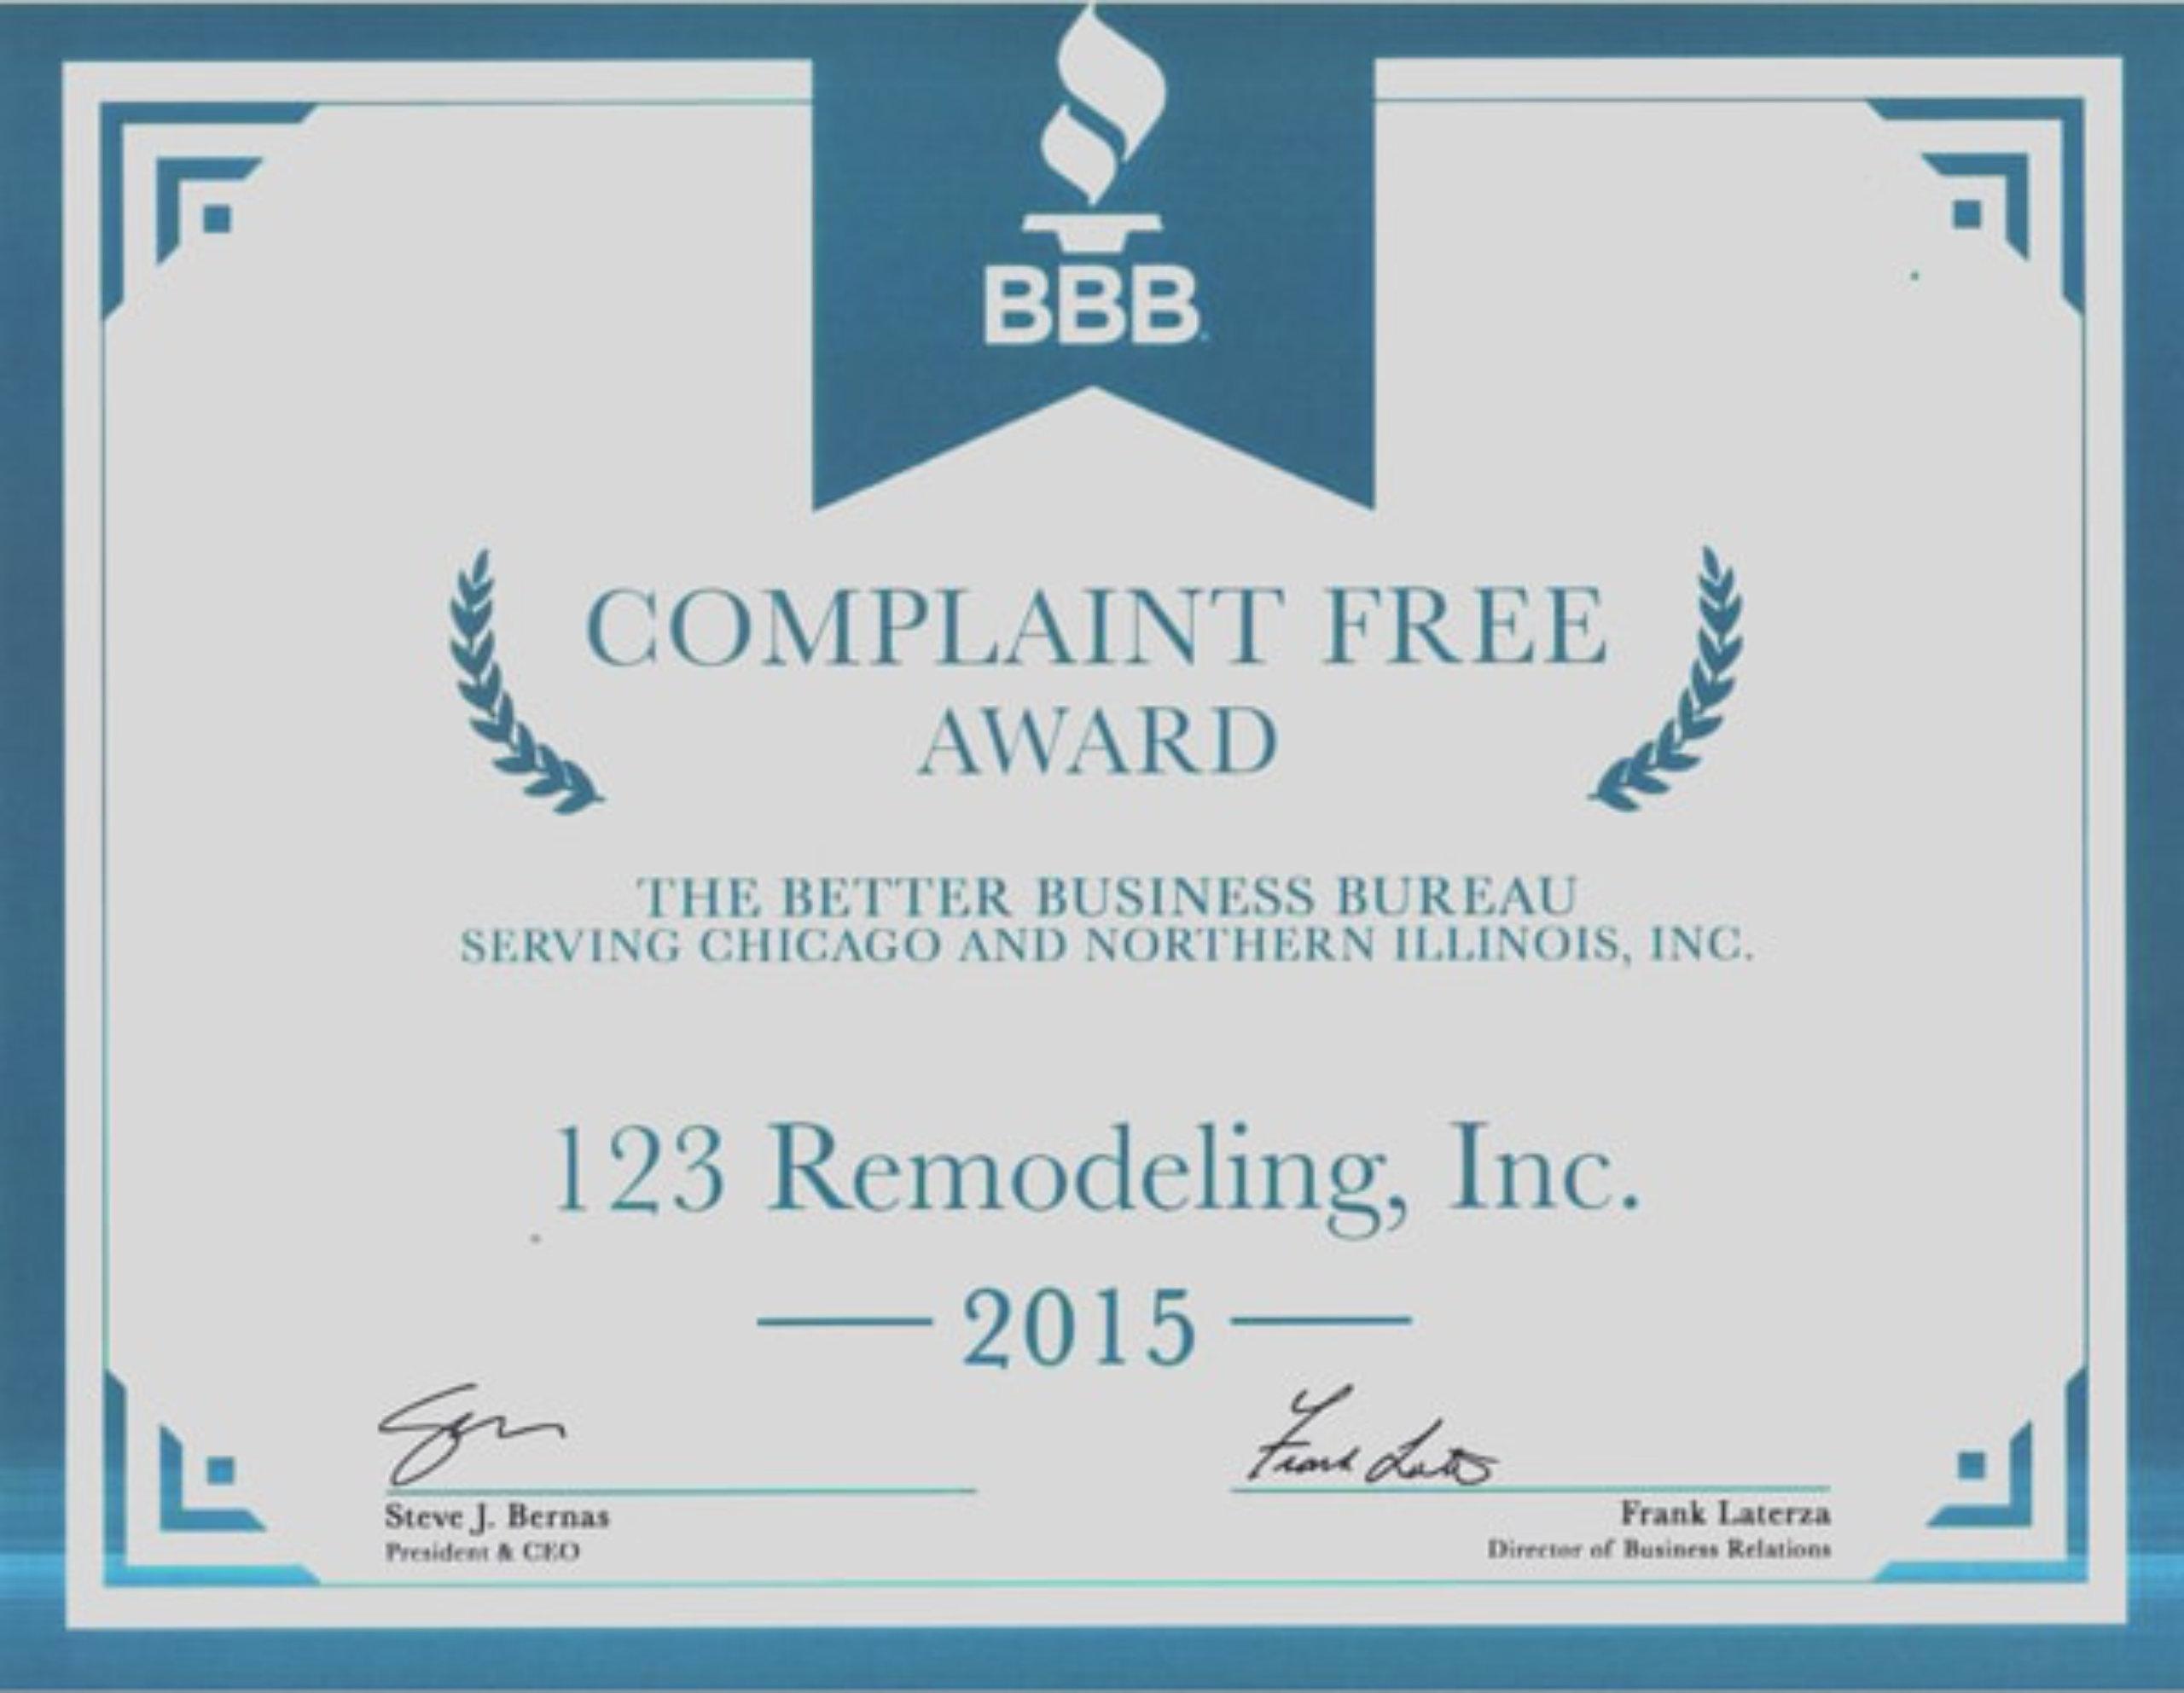 123 Remodeling Complaint Free Award 2015